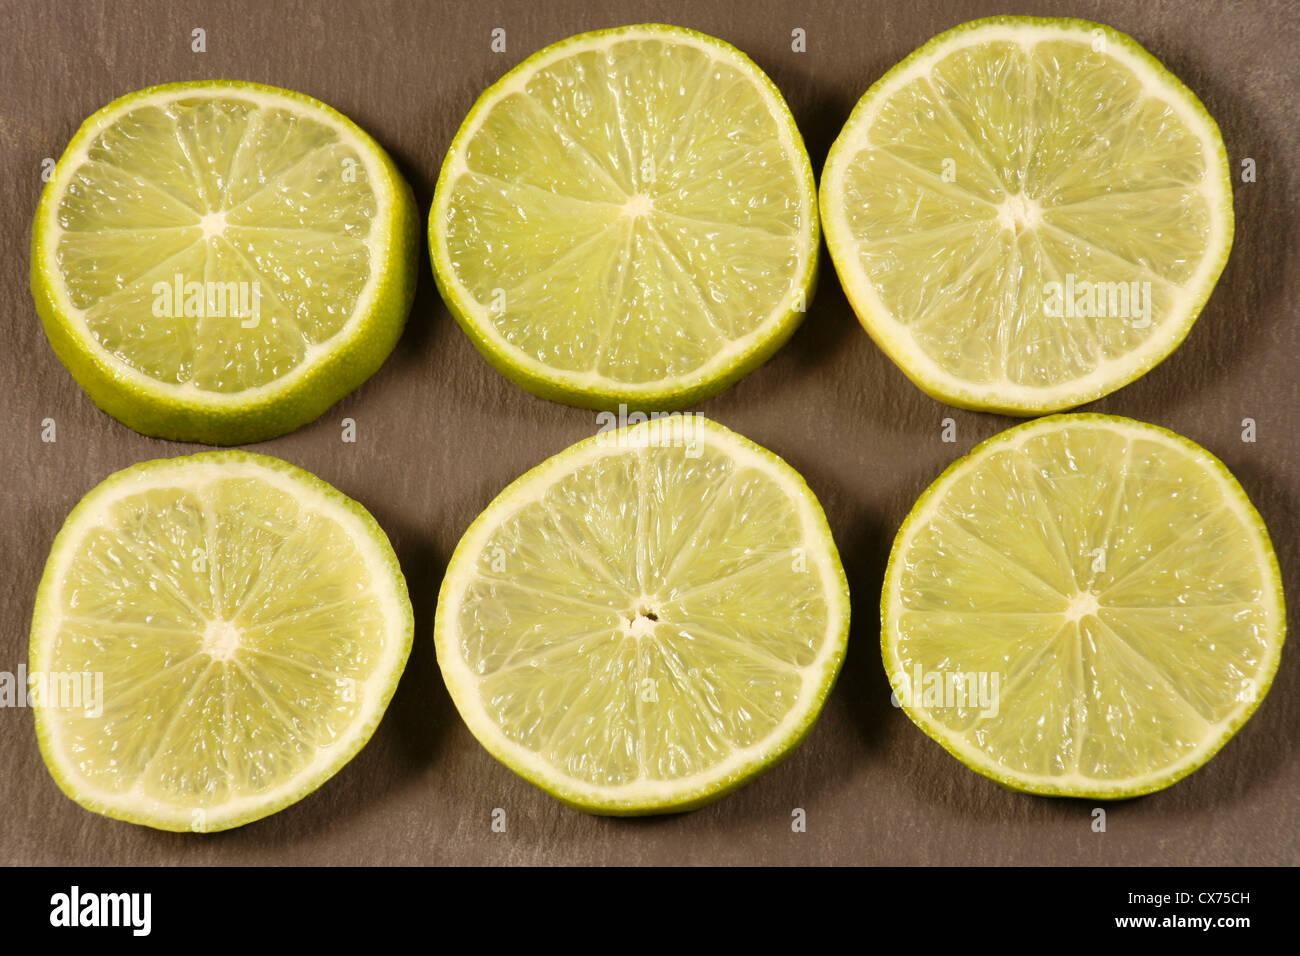 Sliced limes - Stock Image